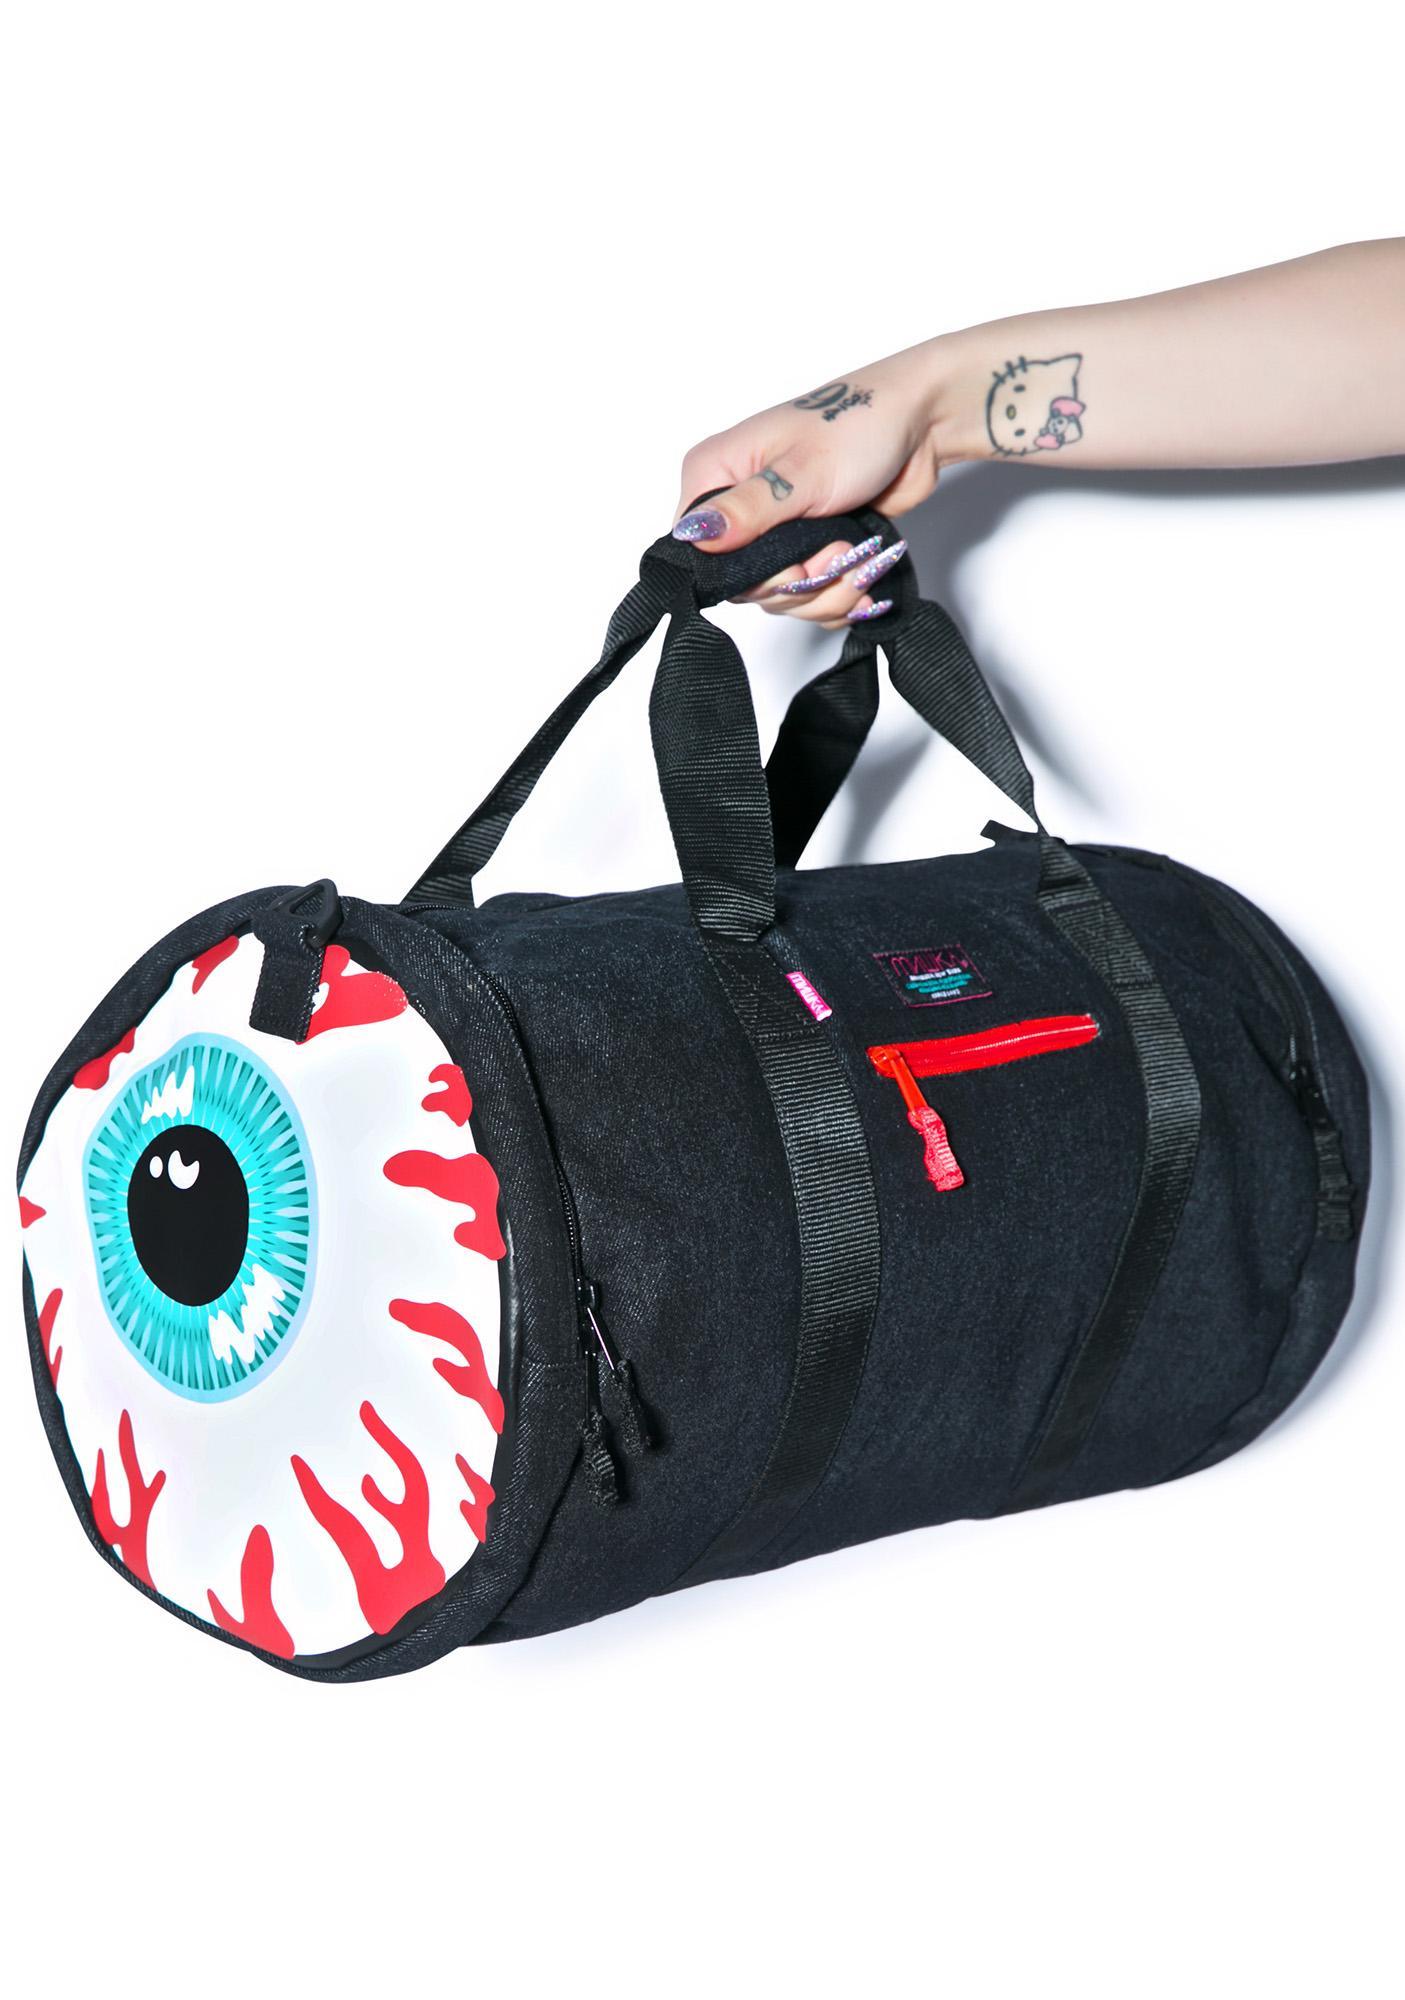 Mishka Keep Watch Denim Duffle Bag